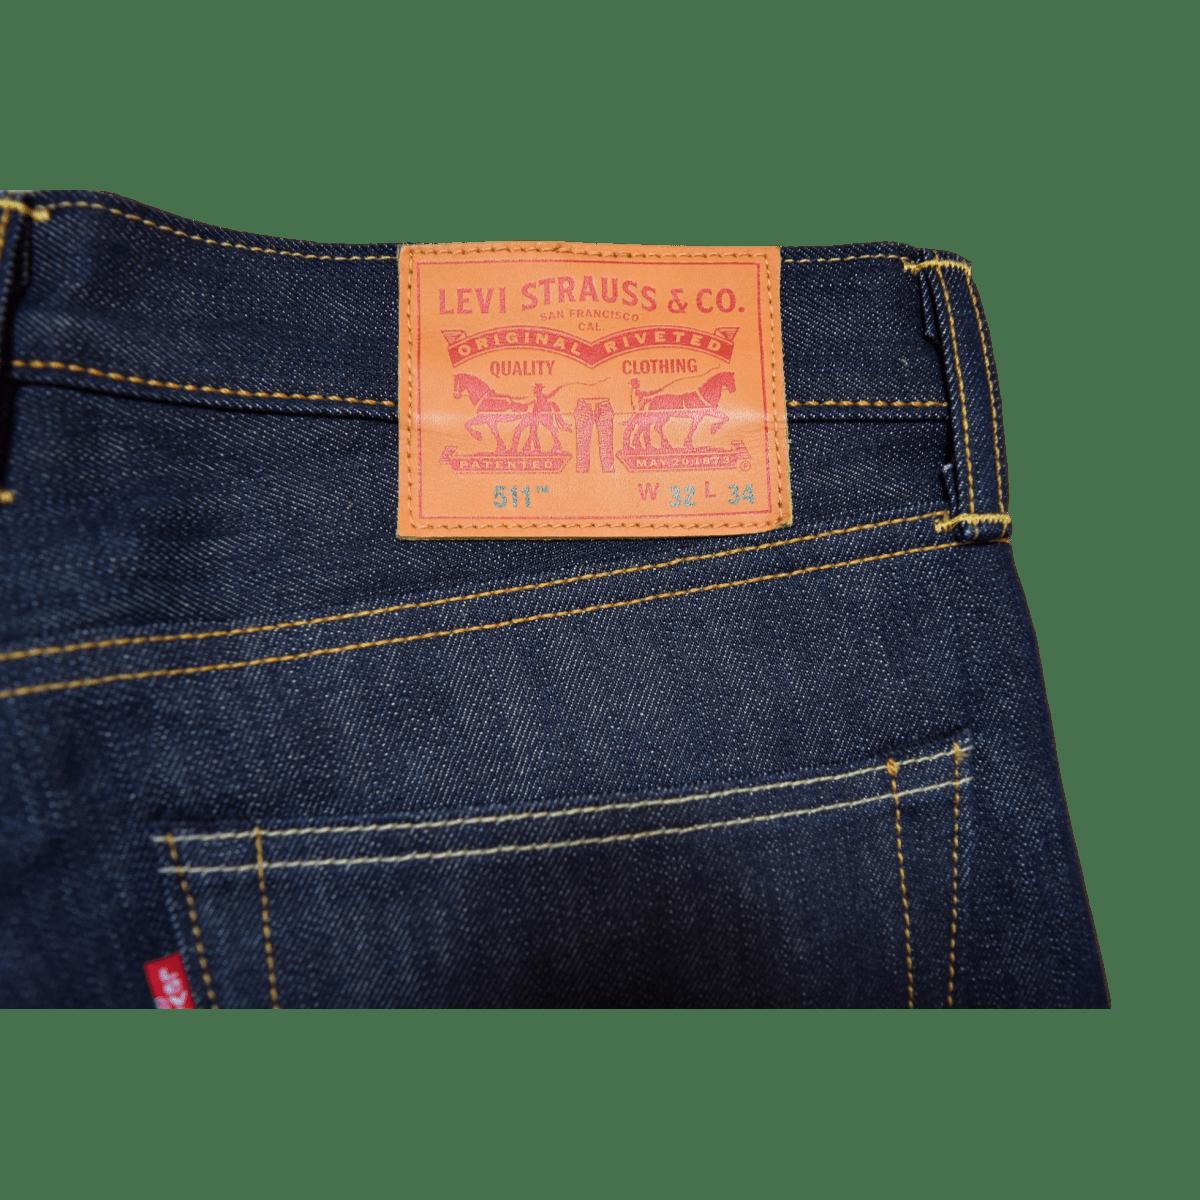 d0689189 Levis 511™ Slim Fit Jeans Raw Selvedge   Garmentory